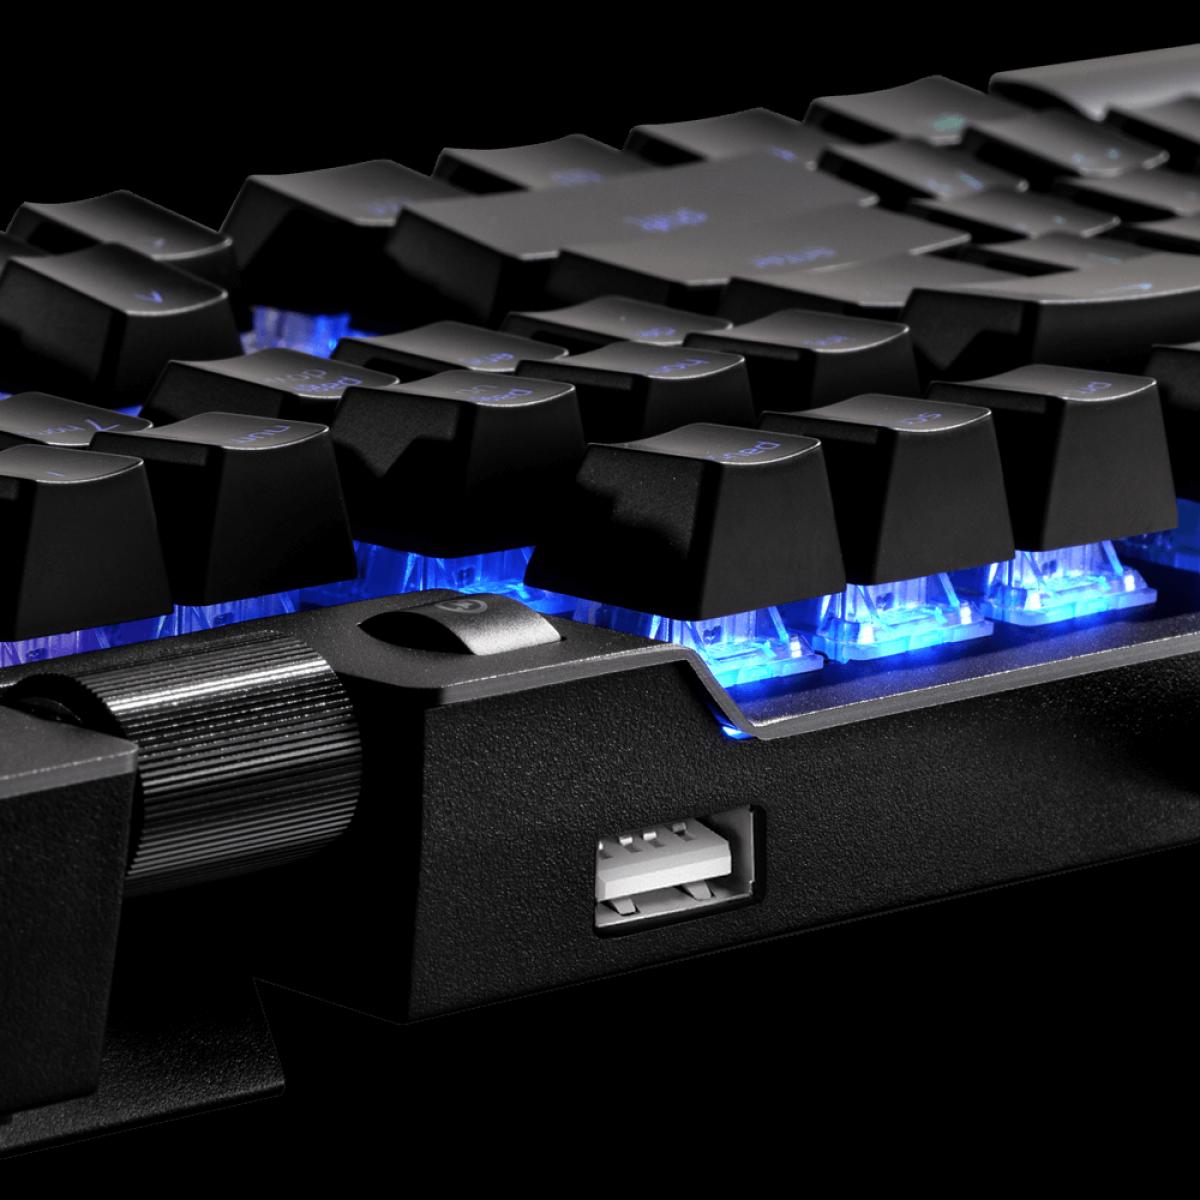 Teclado Mecânico XPG, Summoner, RGB, Switch Cherry MX RGB Blue, ANSI, Black, SUMMONER4B-BKCWW